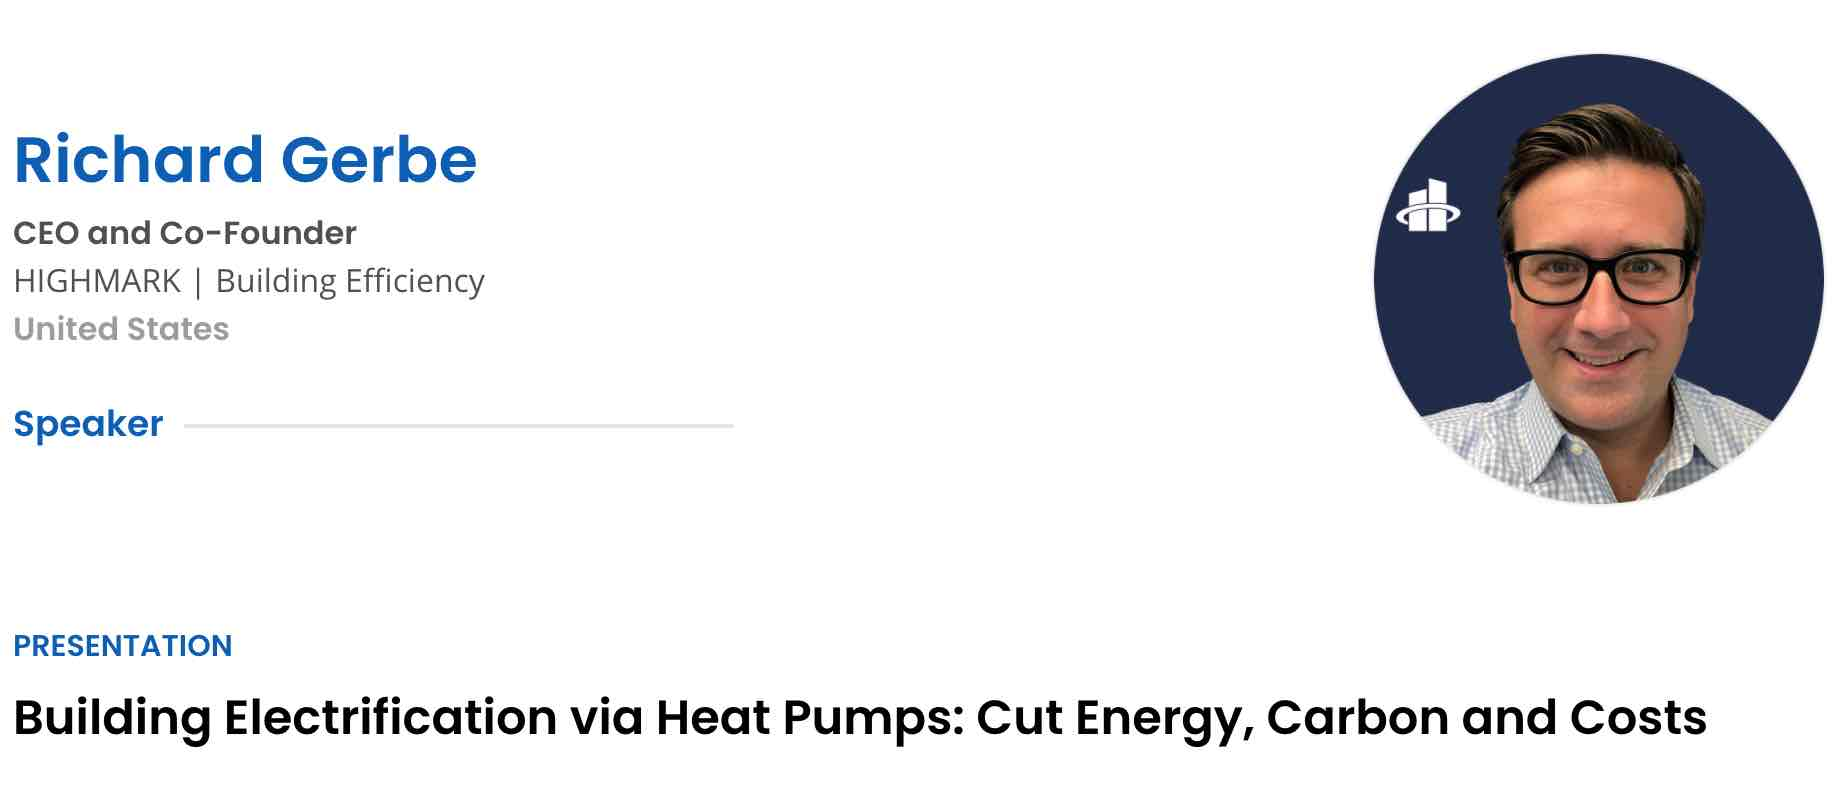 Building Electrification via Heat Pumps: Cut Energy, Carbon and Costs